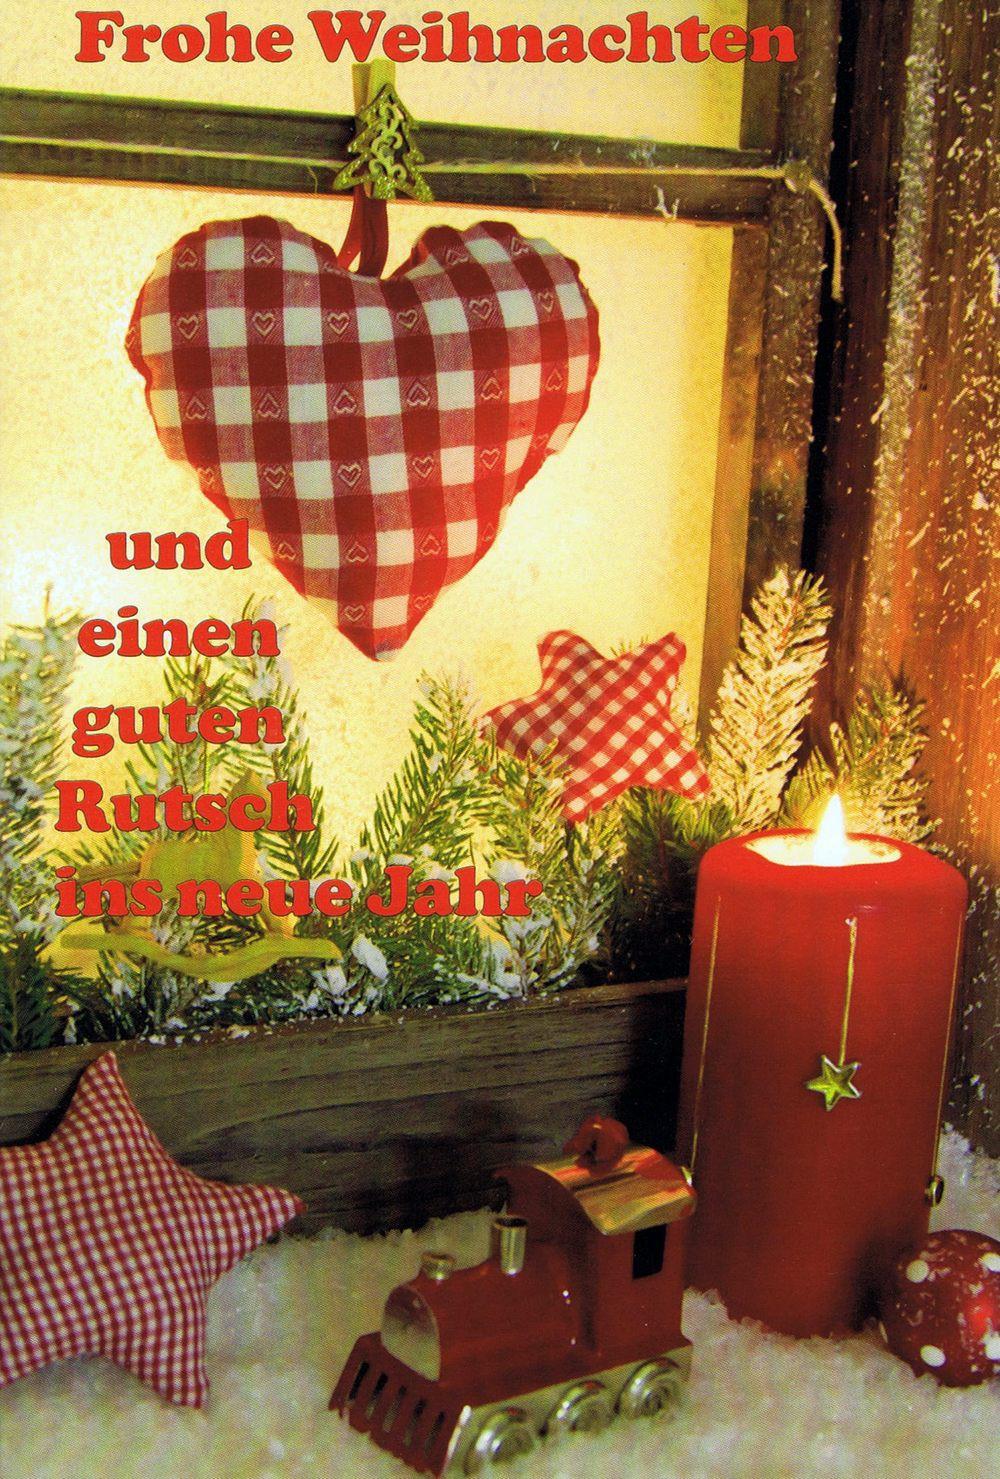 Weihnachtskarte 3 - Kerze am Fenster